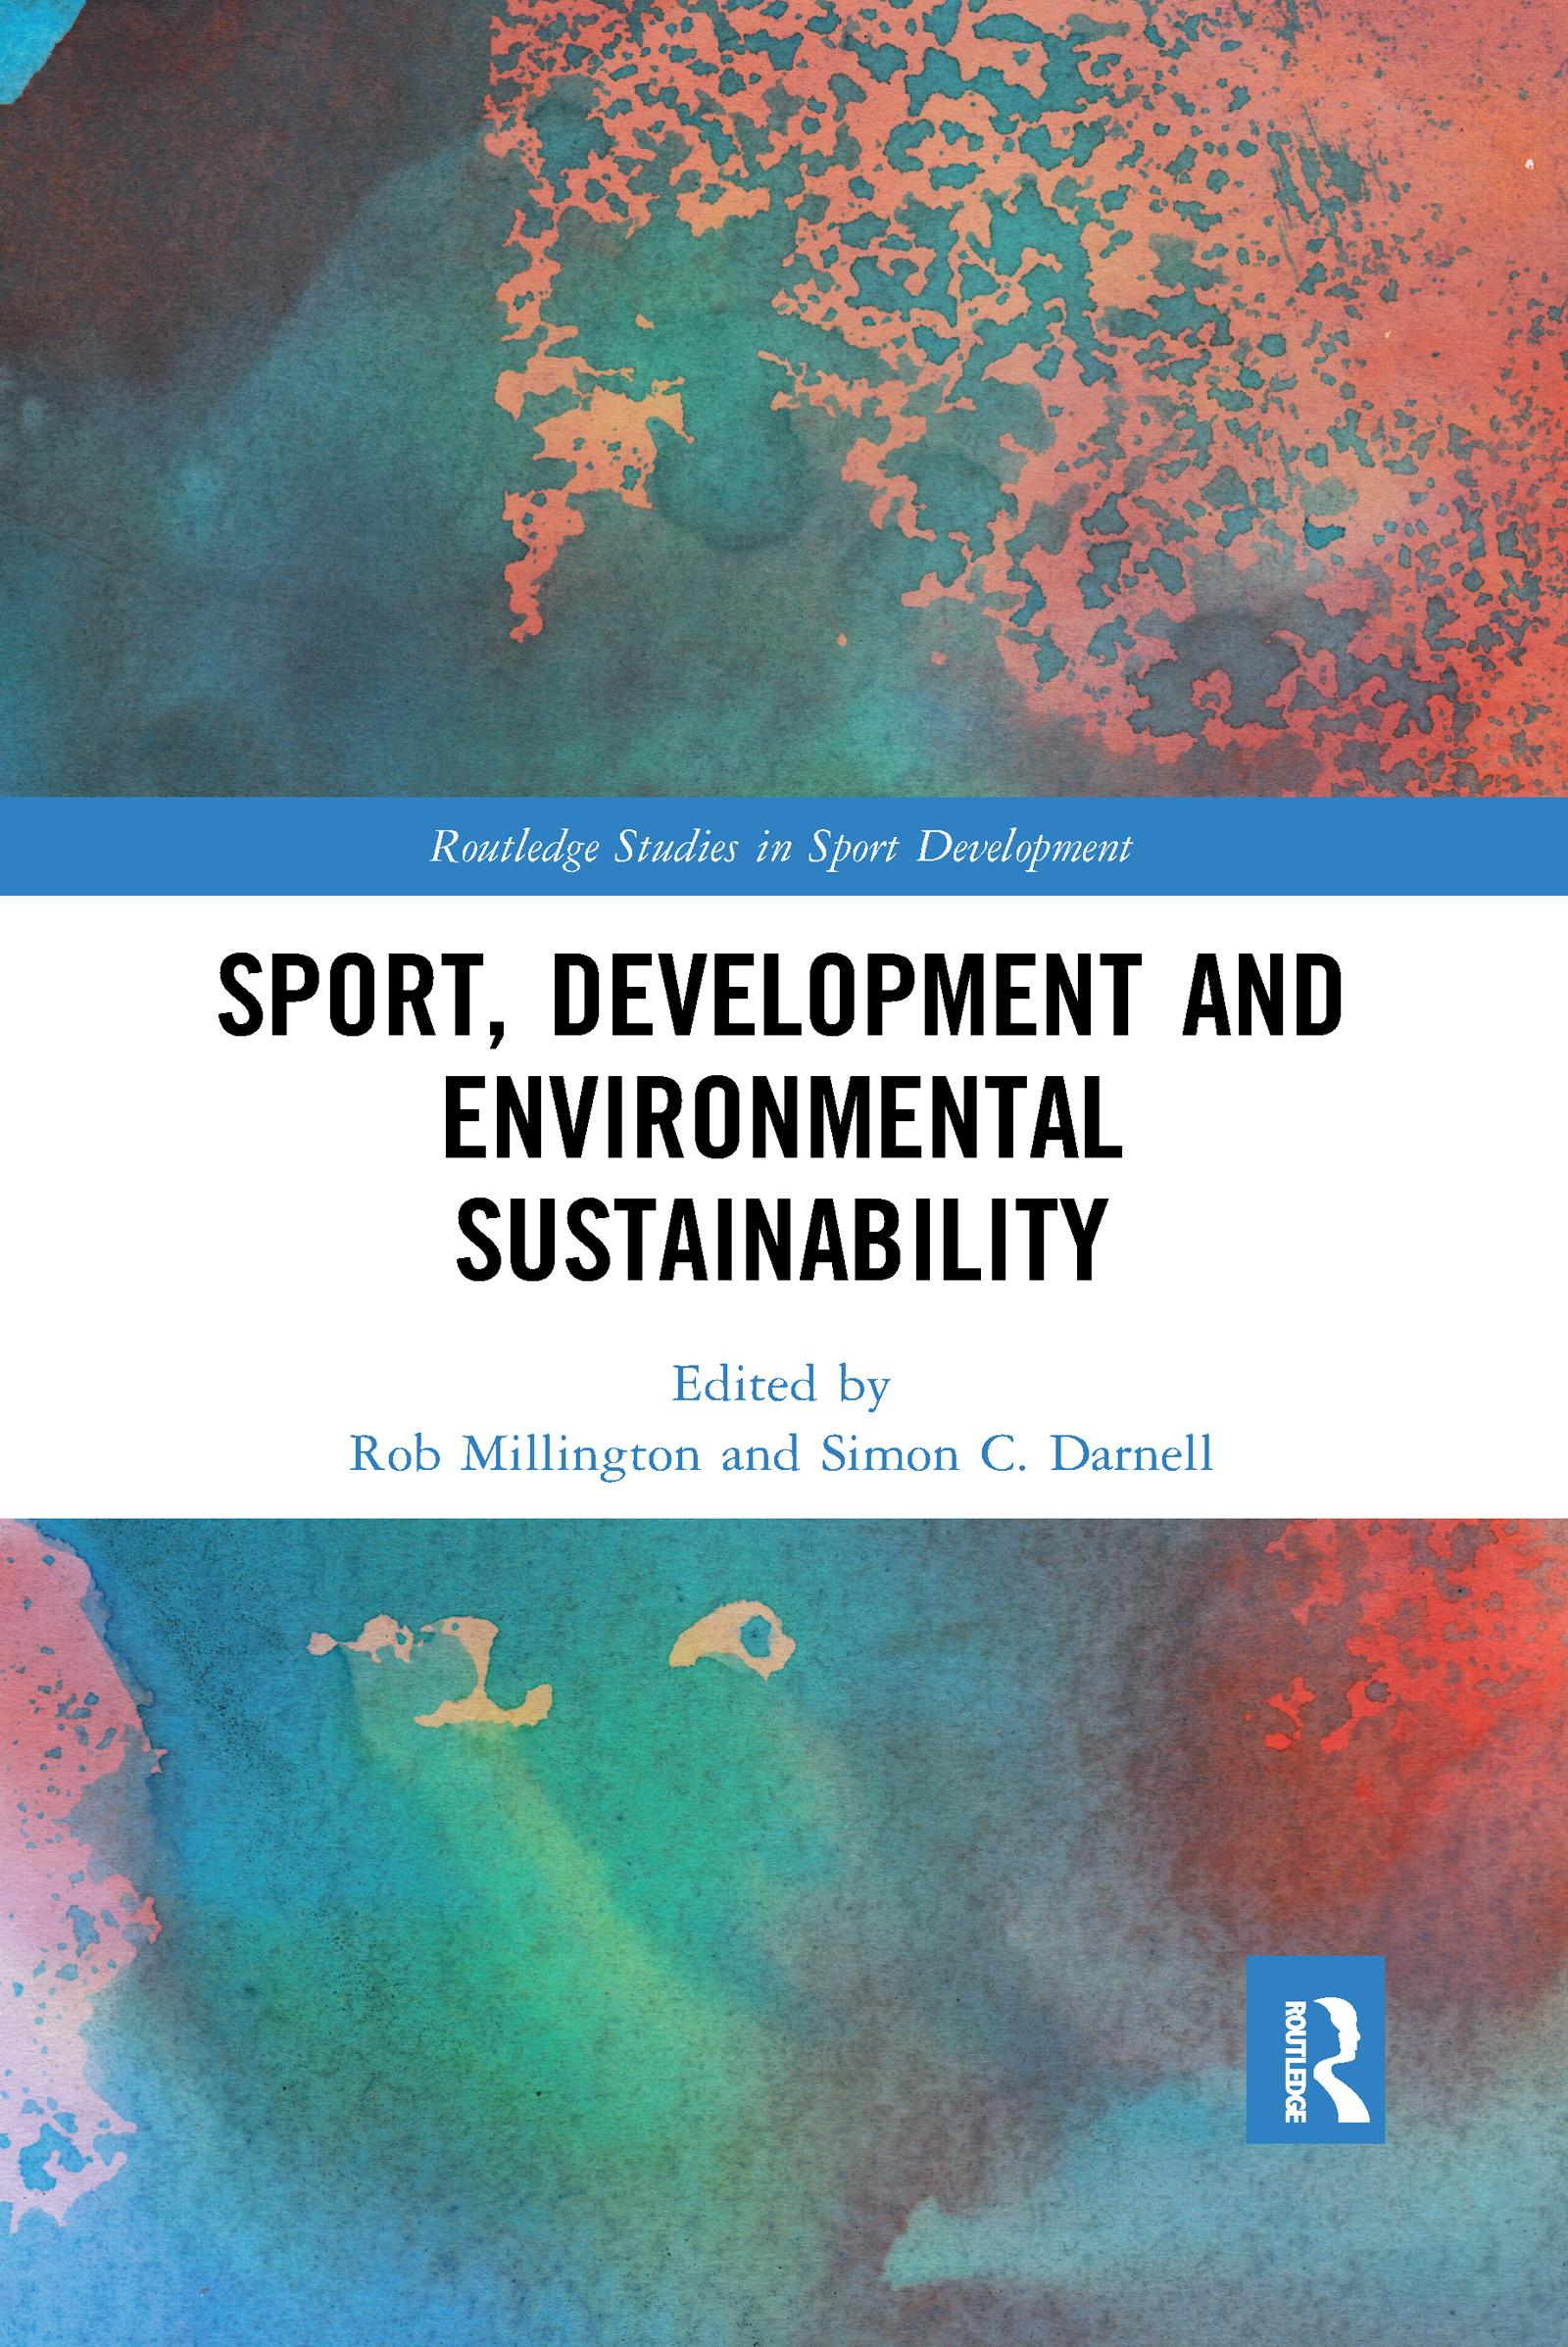 Sport, Development and Environmental Sustainability